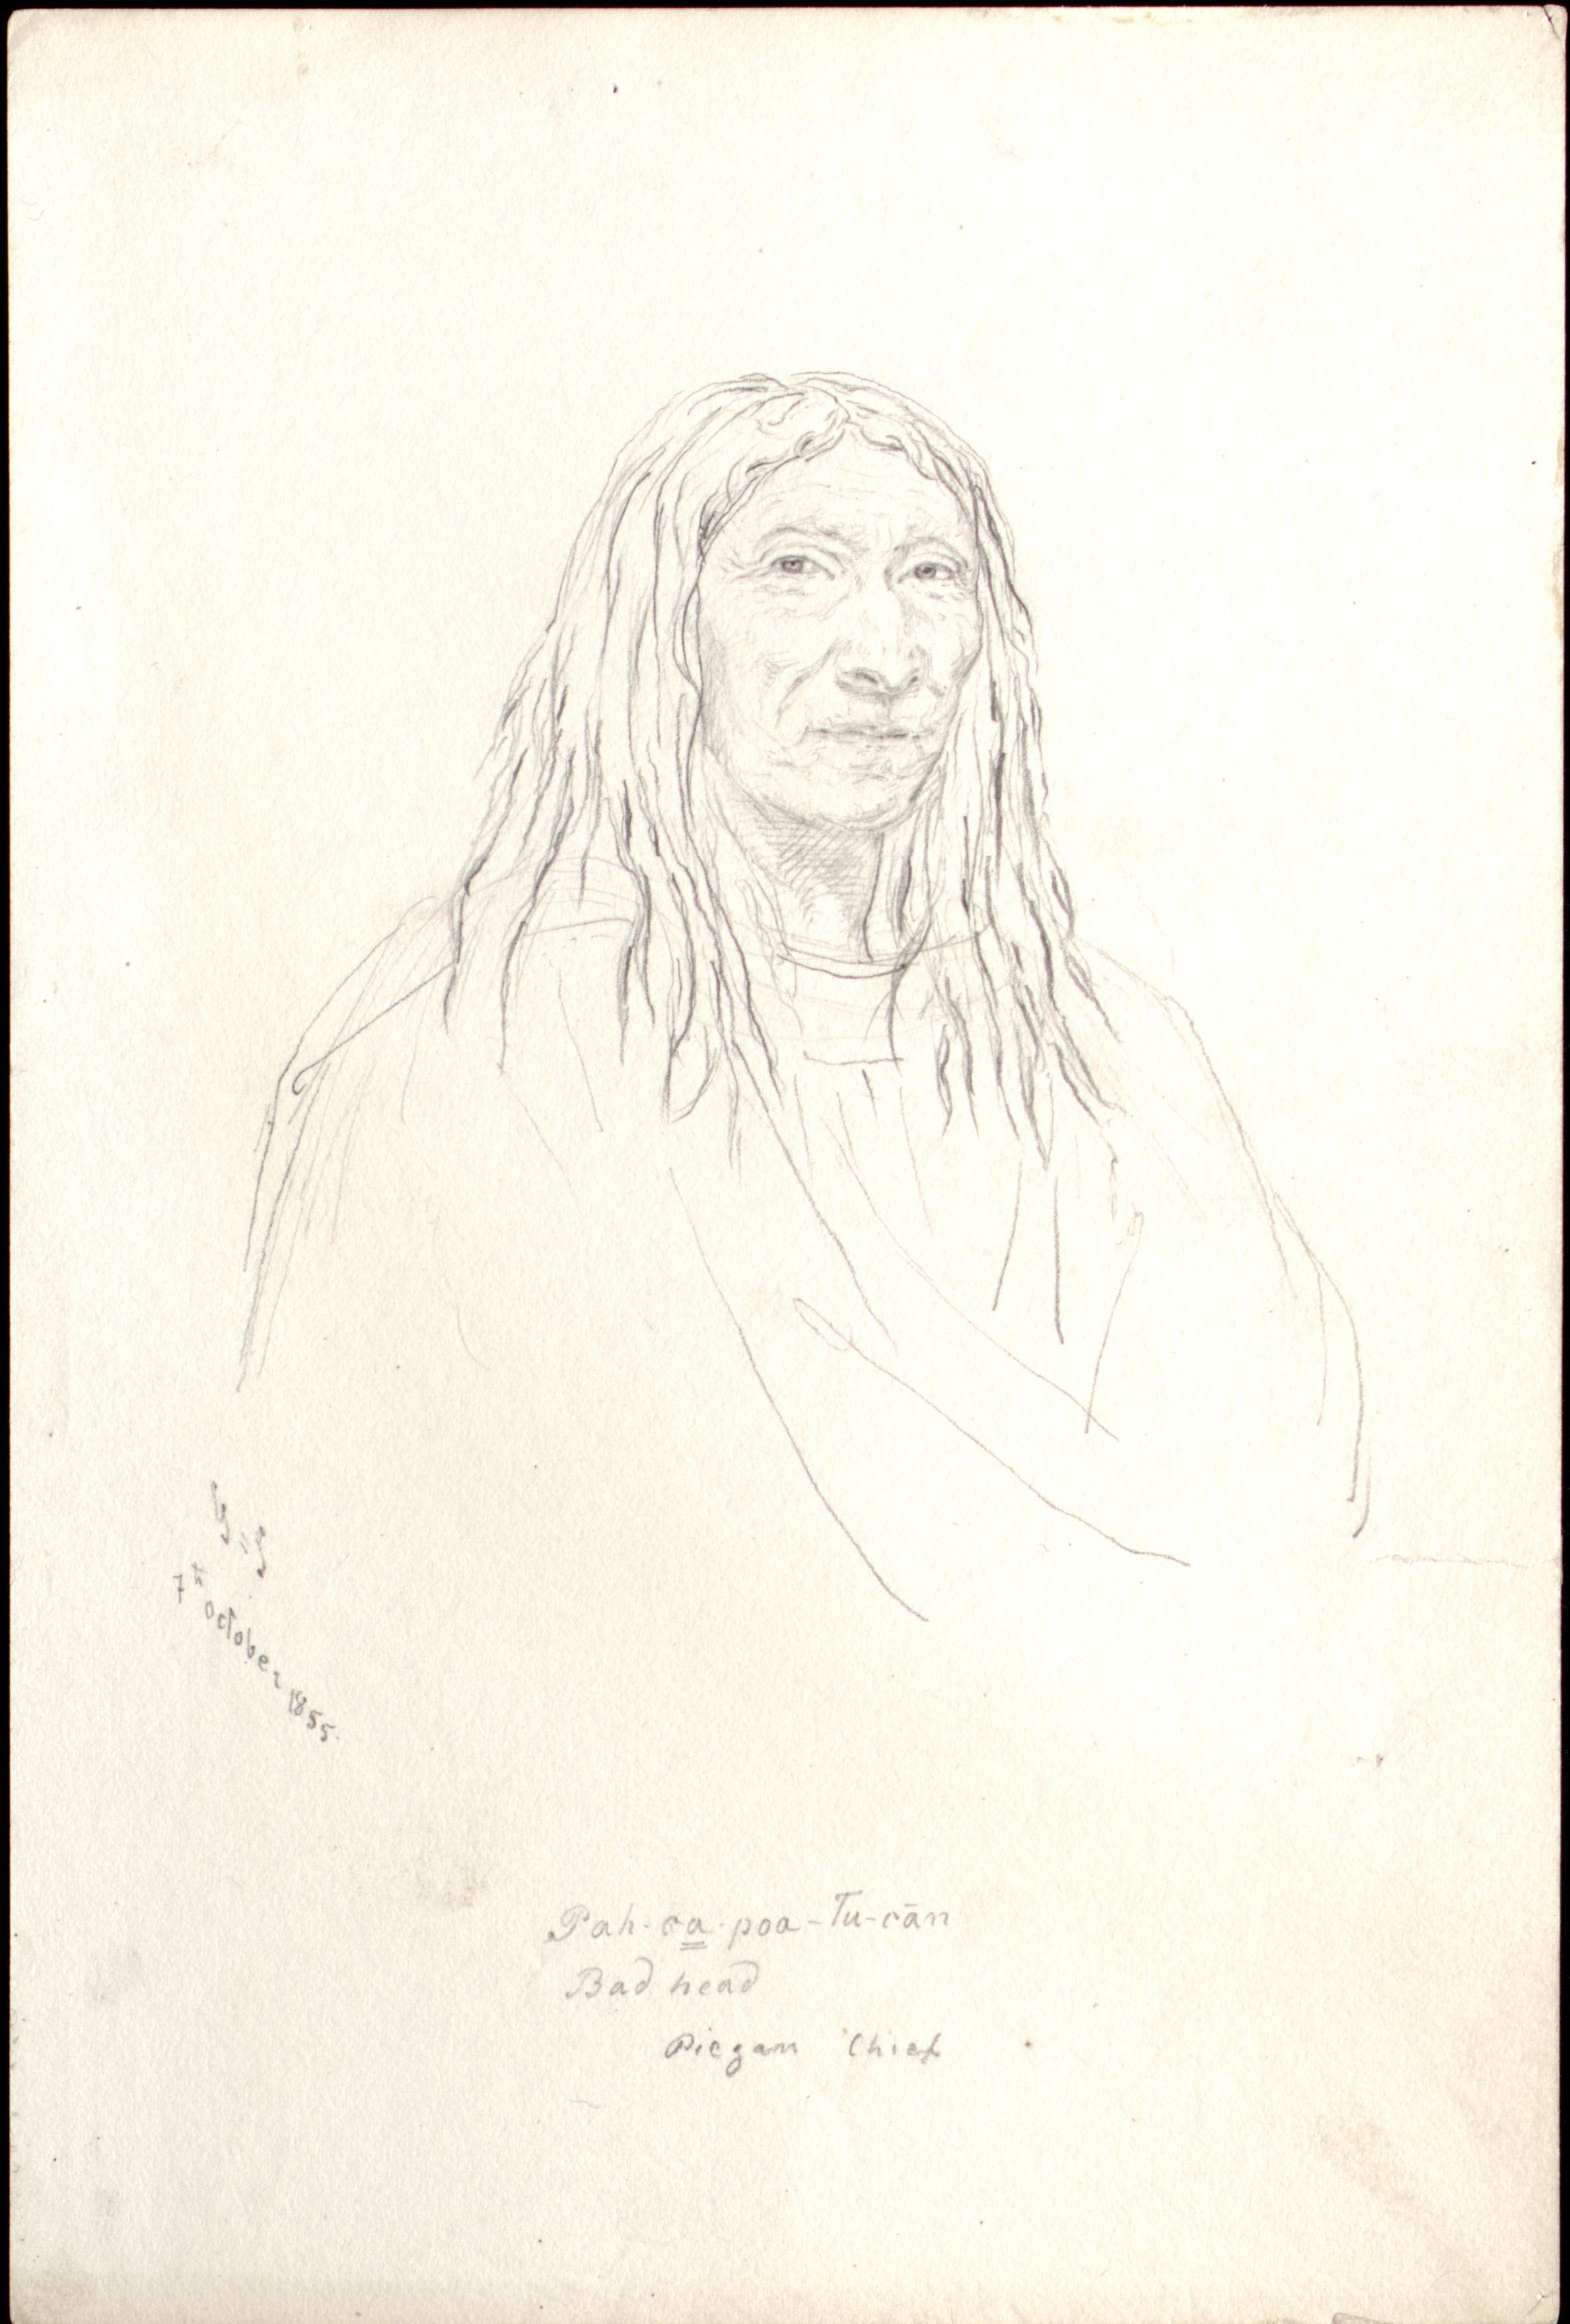 Pah-ca-poa-tu-can  Bad head  Pigean Chief